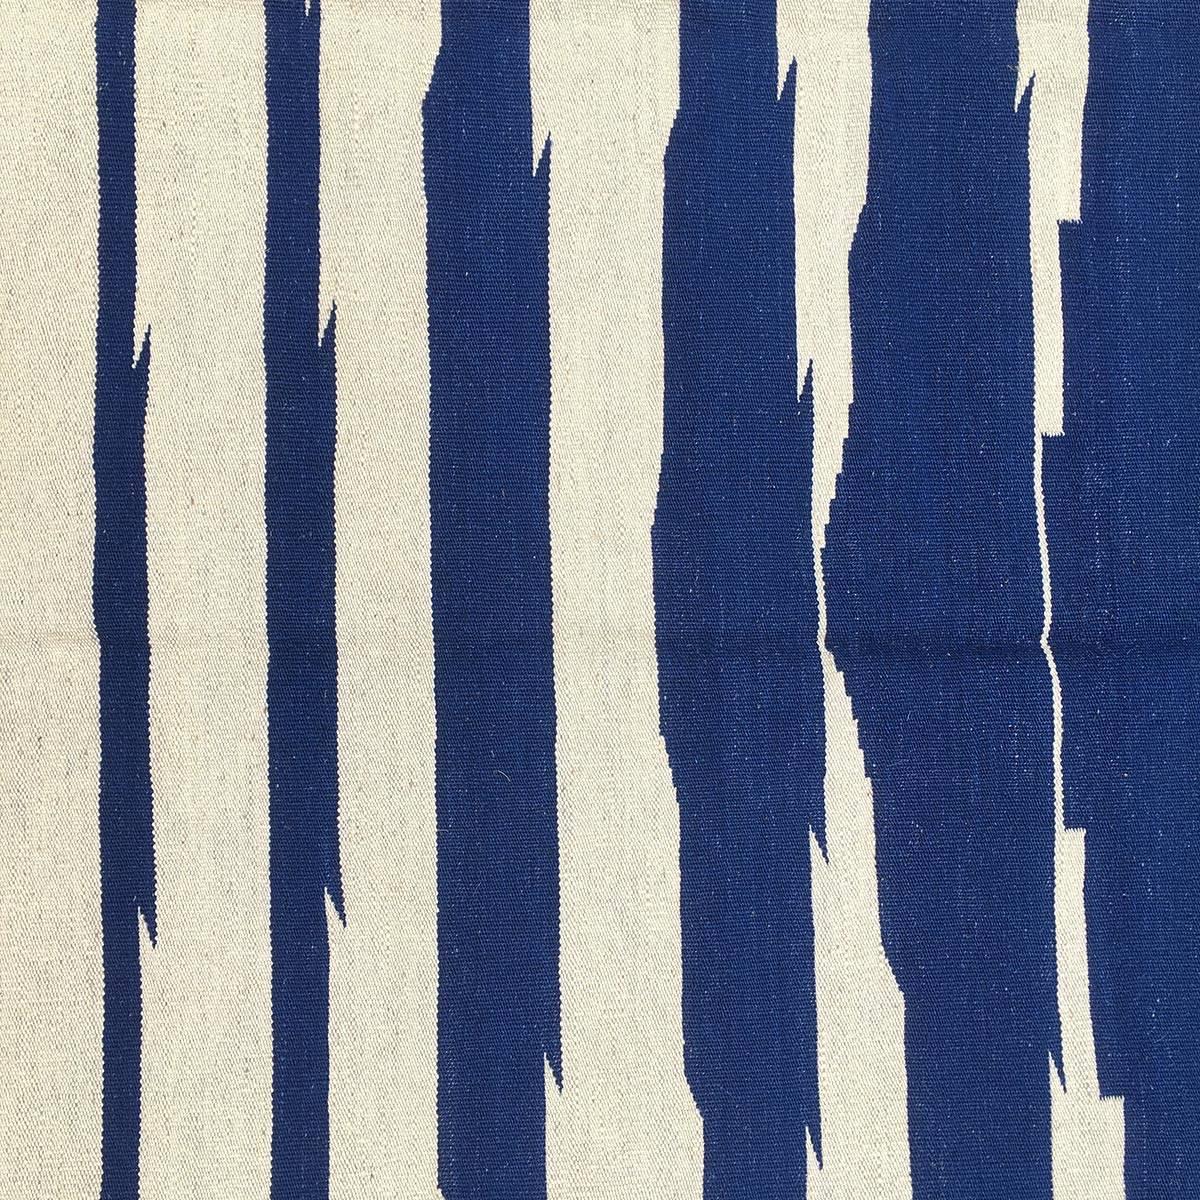 Kilim bicolor blauw - wit